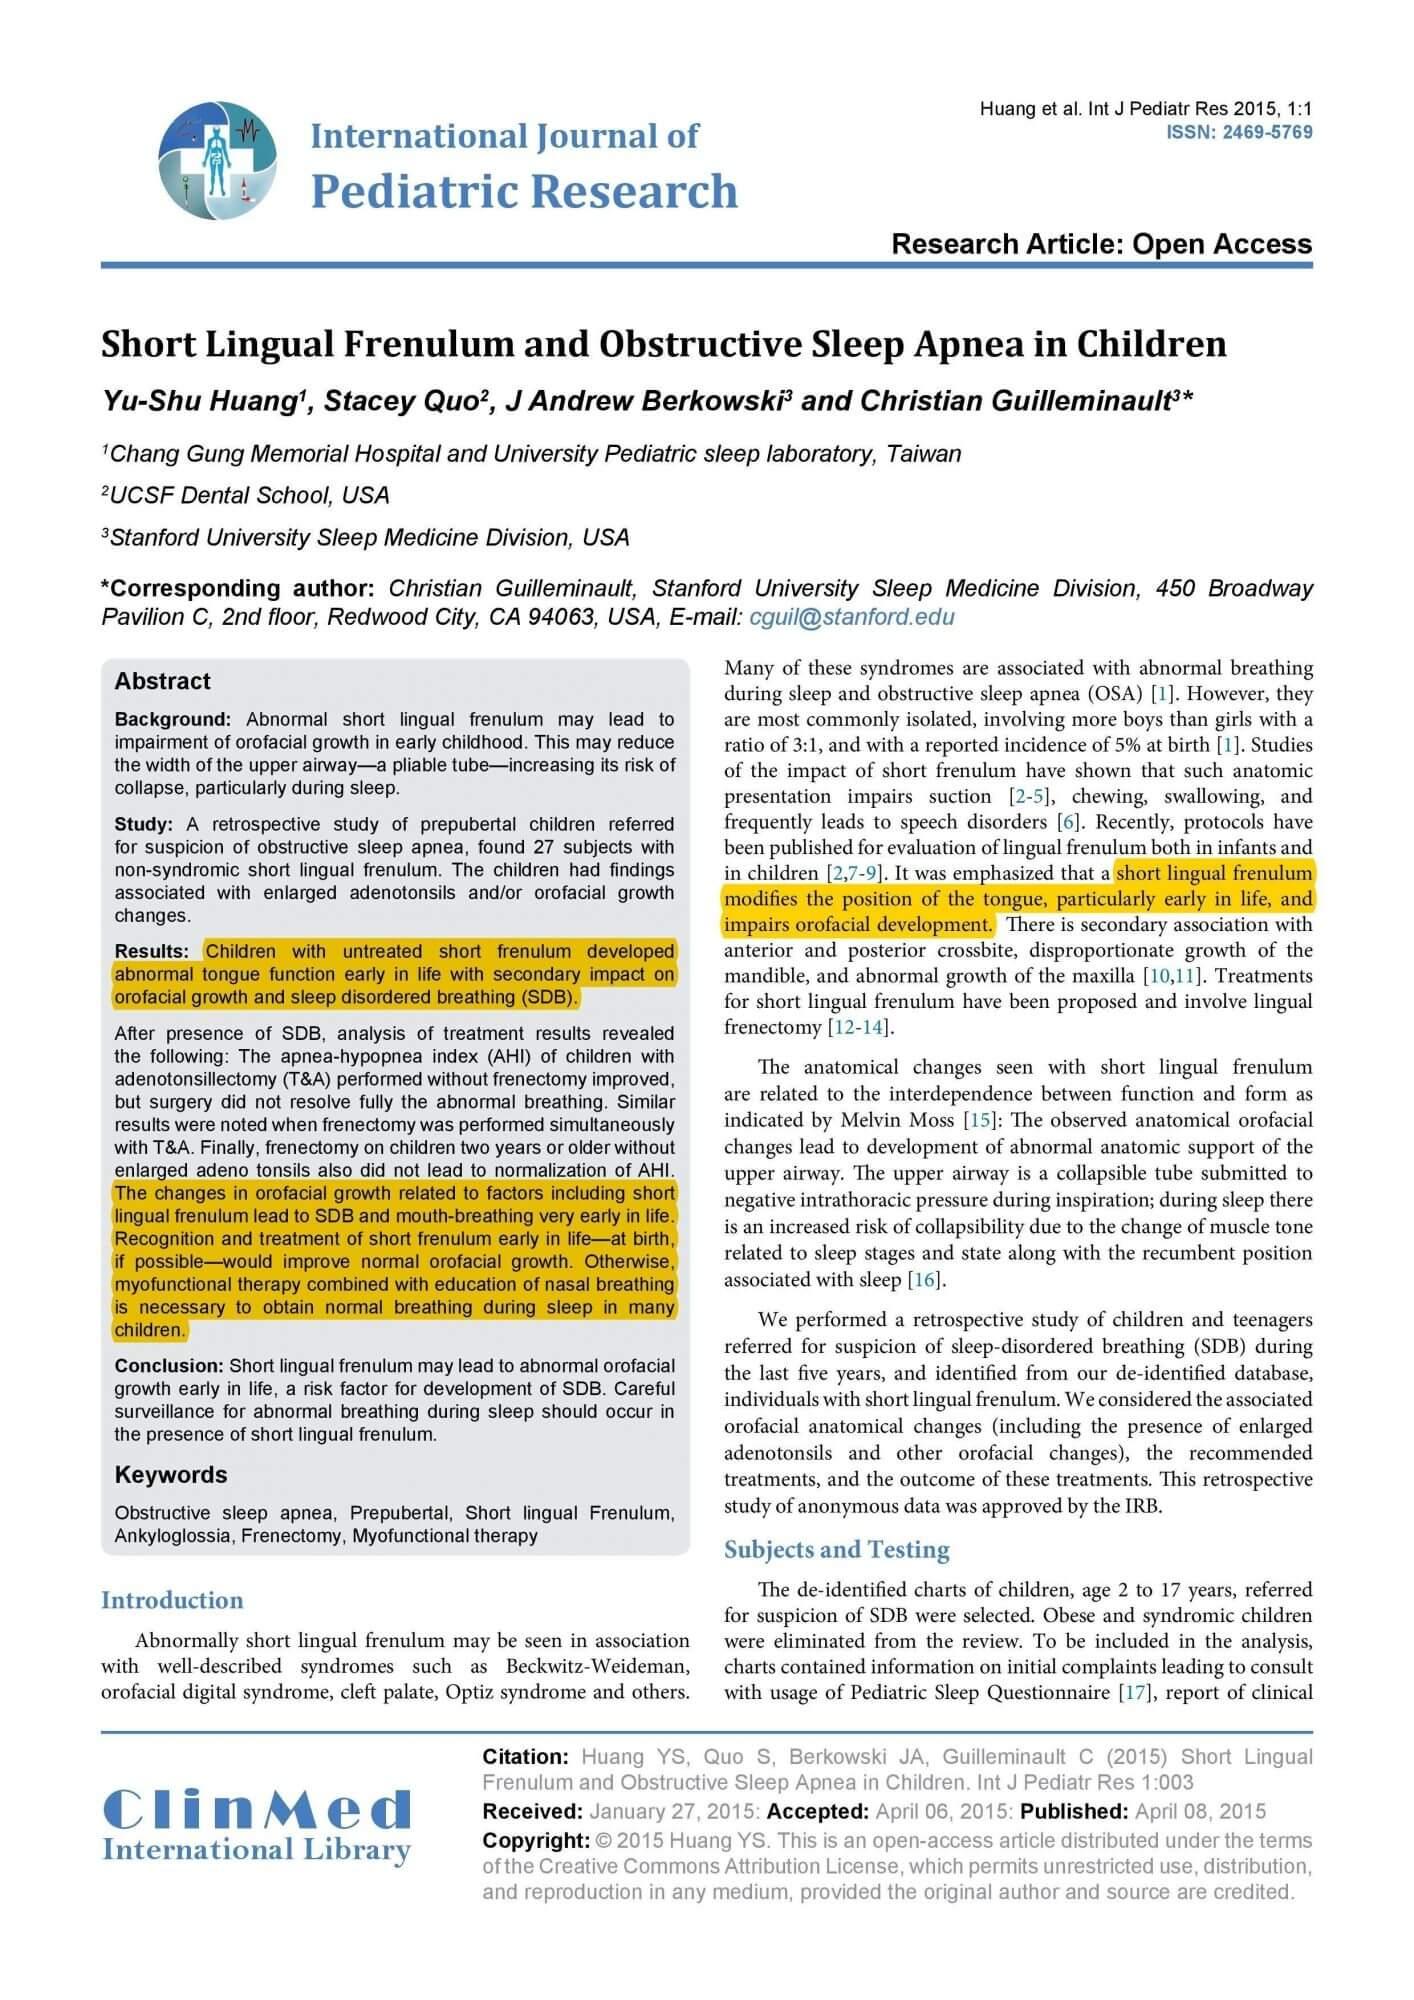 Short Lingual Frenulum and Obstructive Sleep Apnea in Children-1